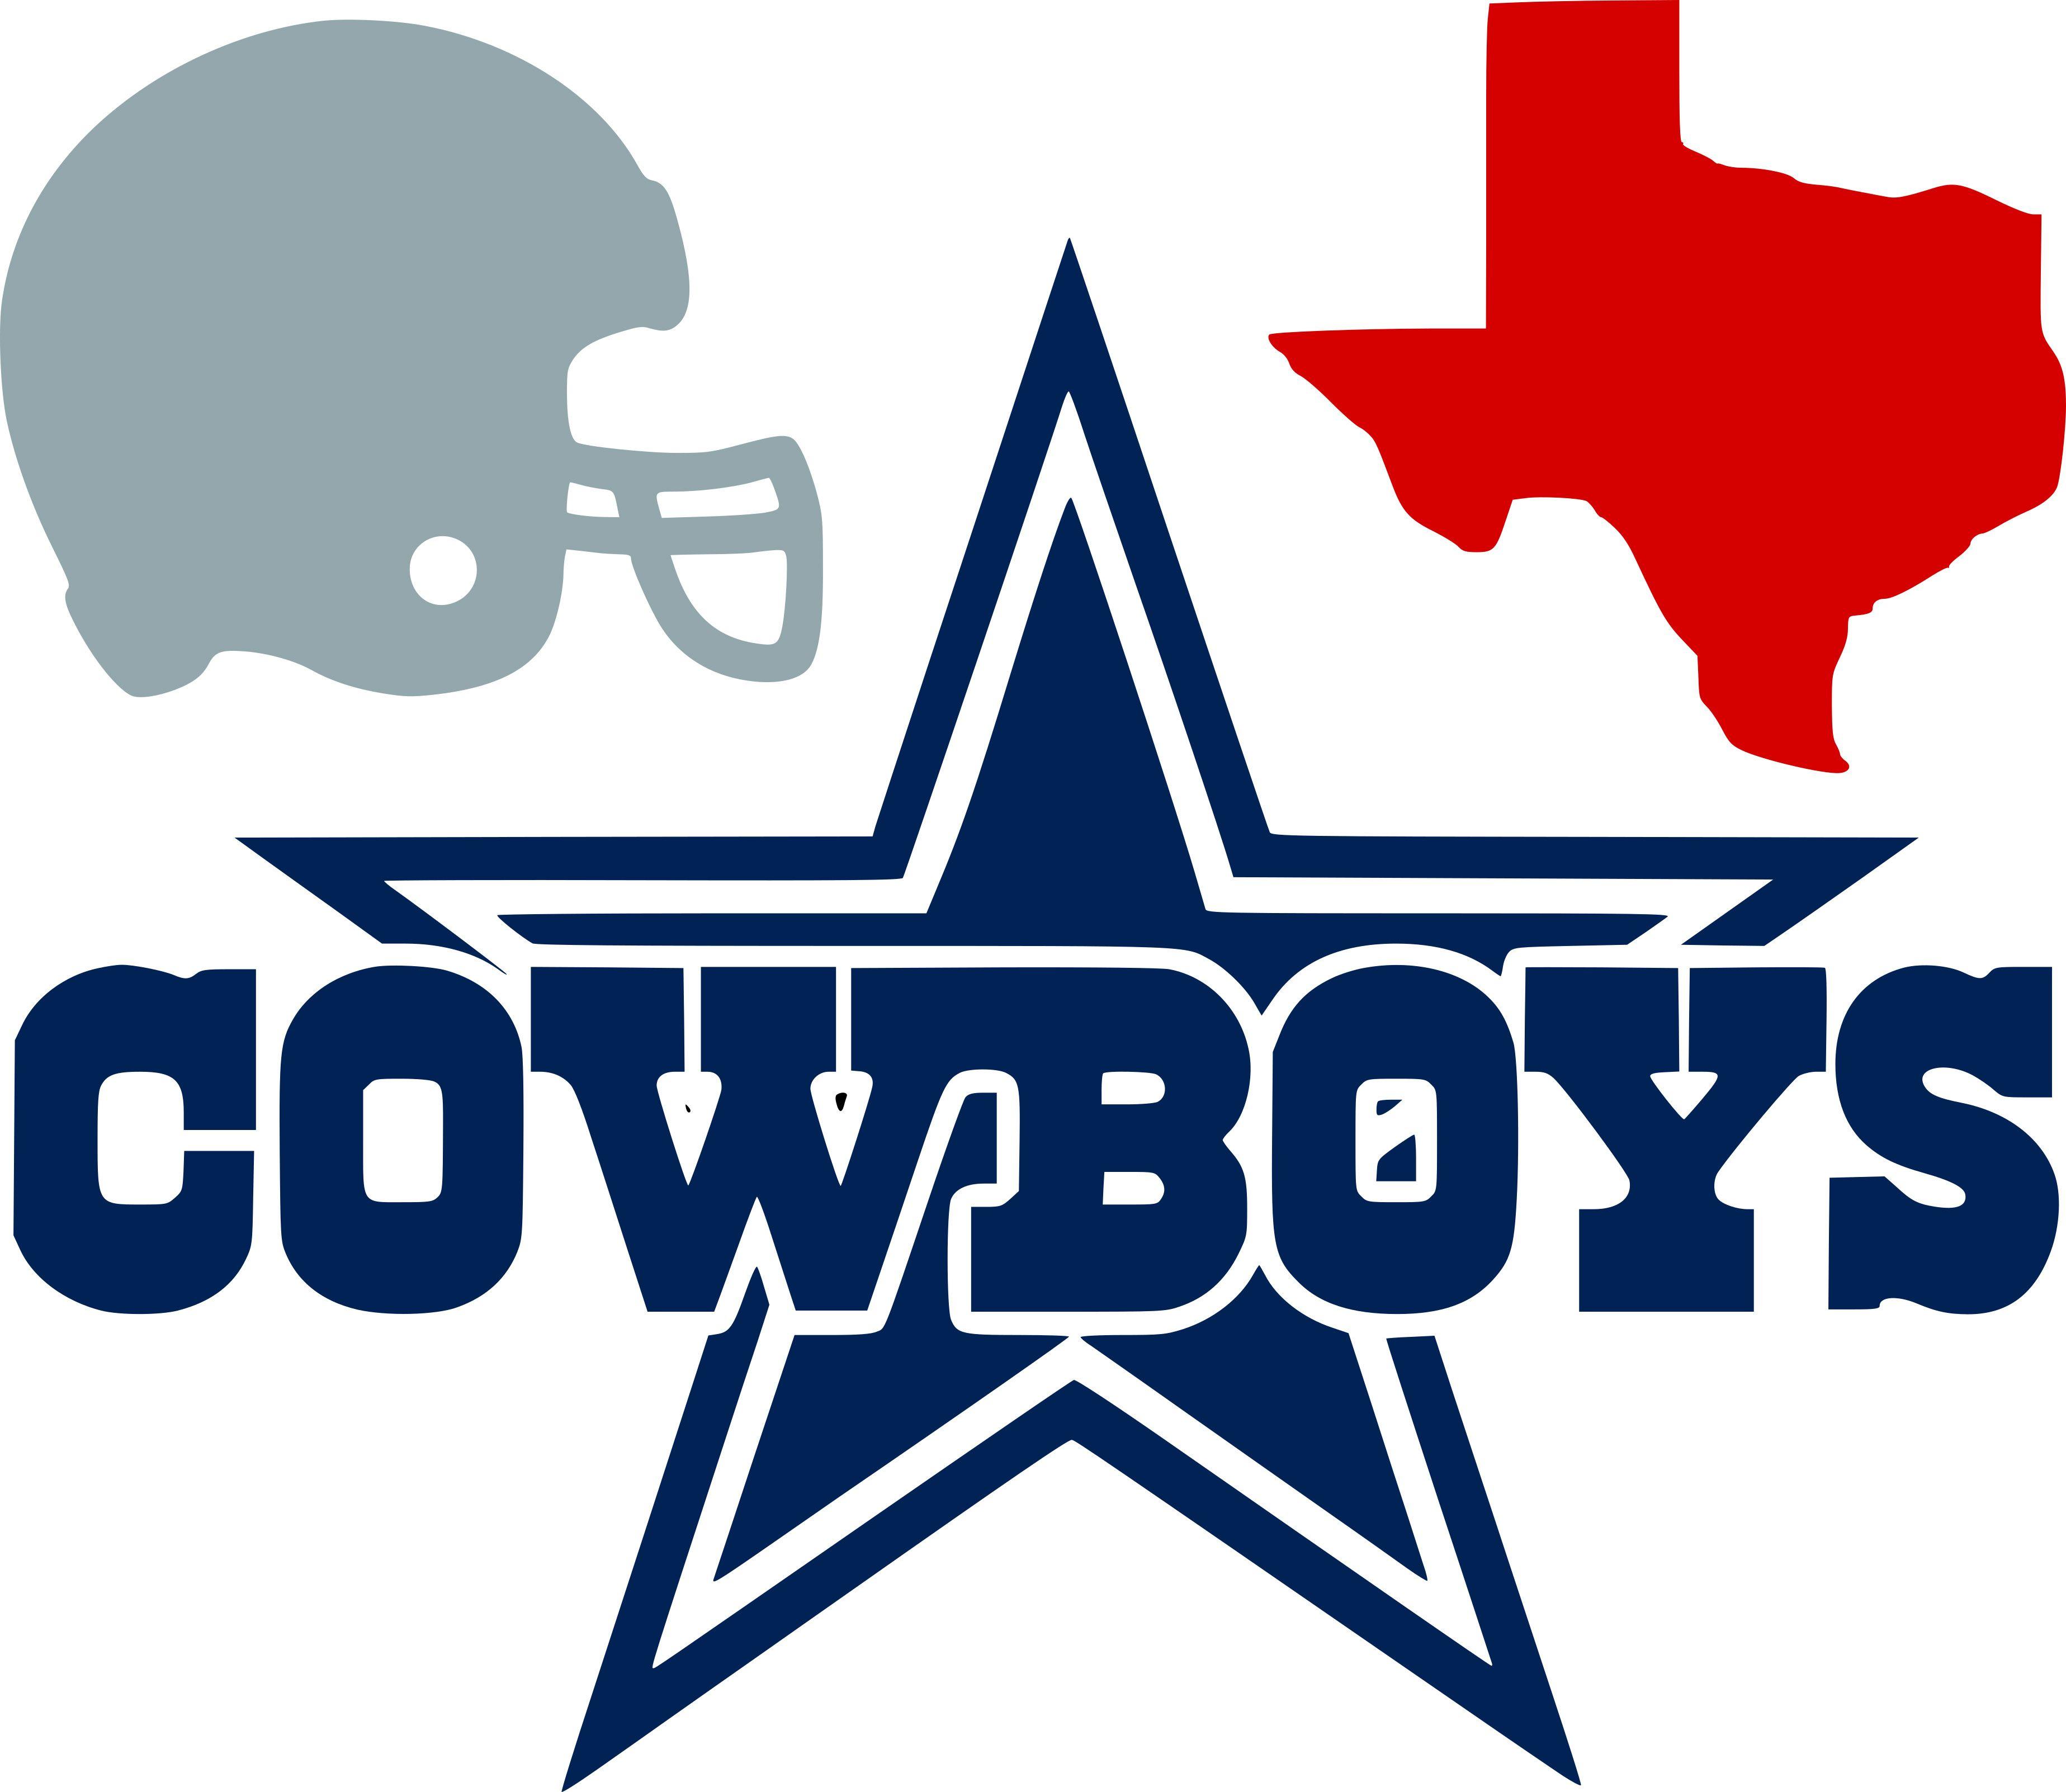 Dallas Cowboys SVG png pdf eps dxf File Cutouts Files Logo Silhouette Cricut Files Stencils Decals Team Sport AT/&T Stadium football